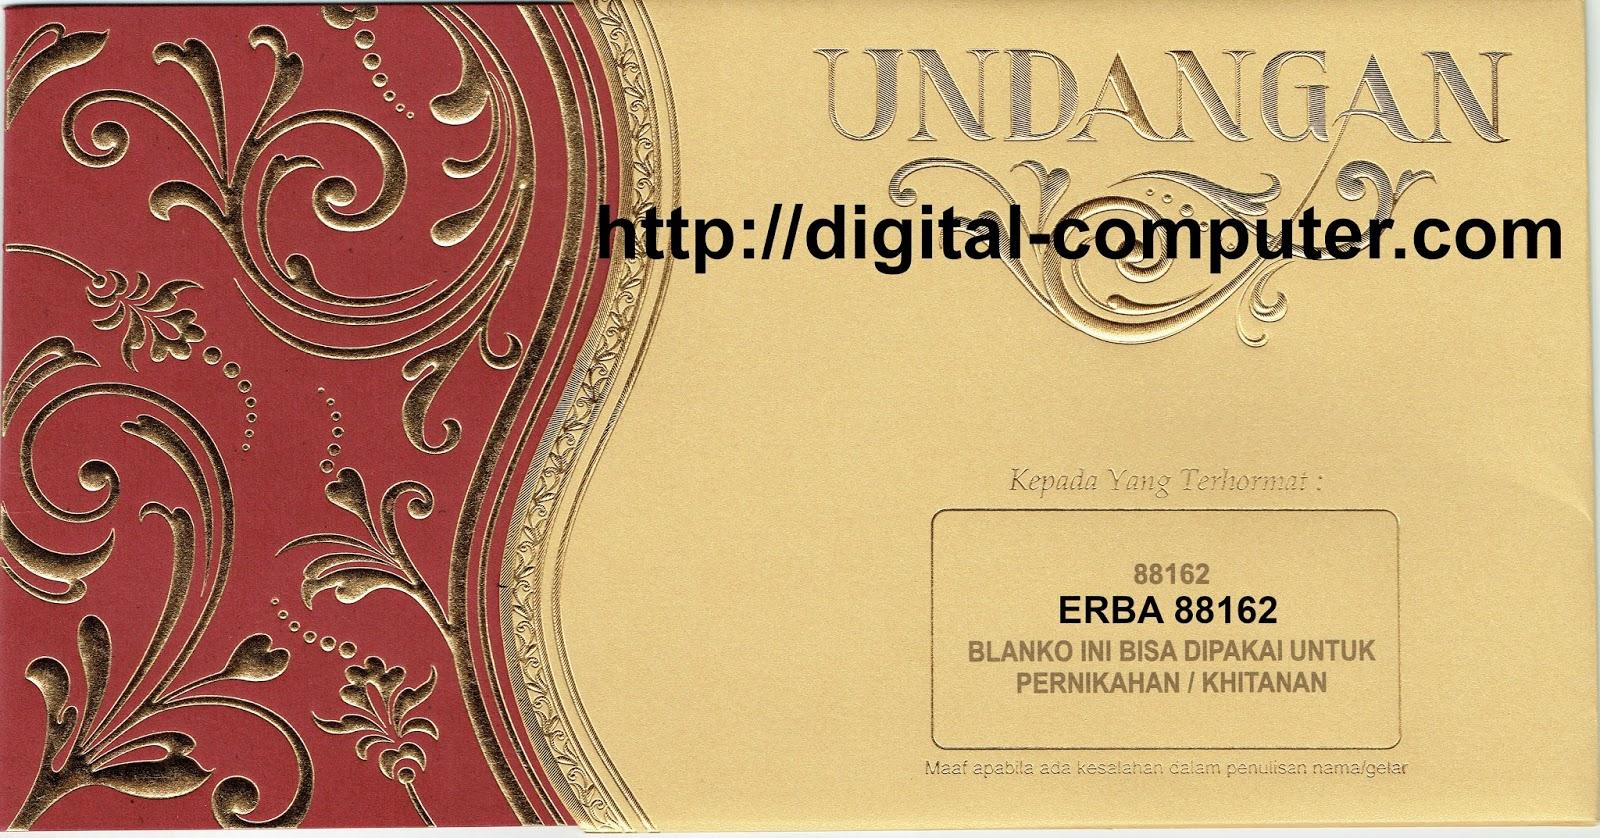 Undangan Softcover ERBA 88162